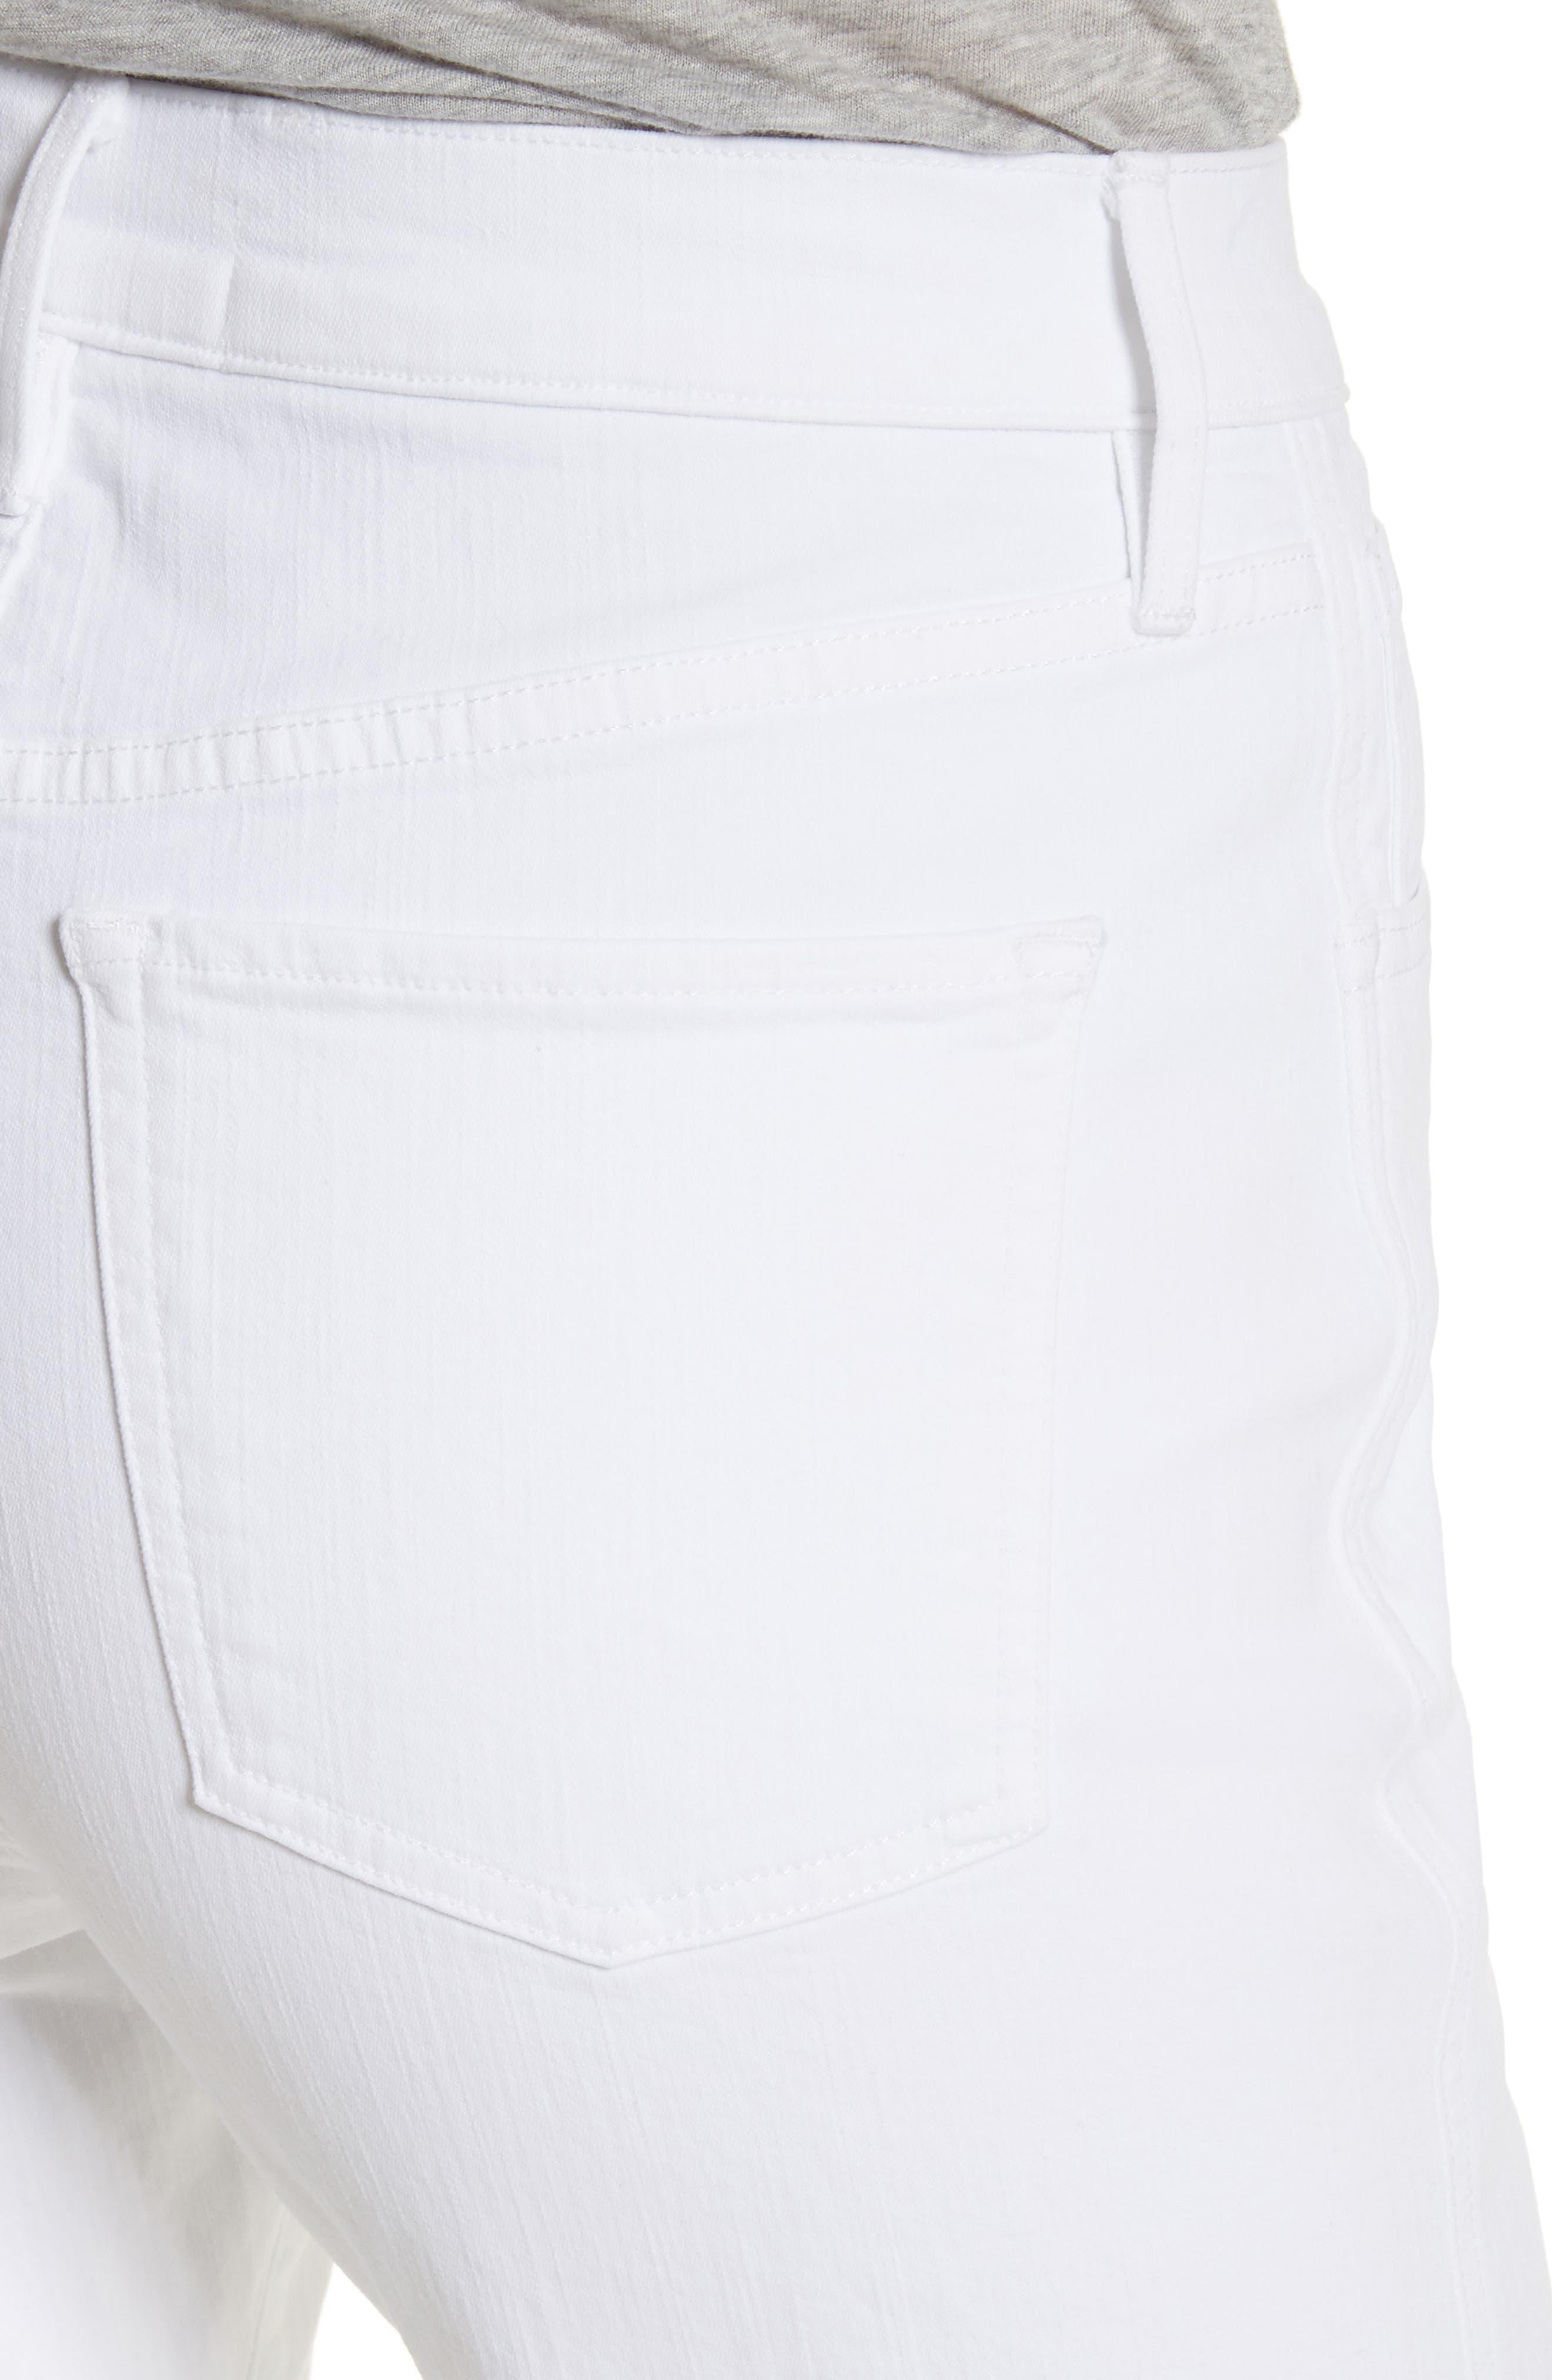 W4 Adeline Split Leg Flare Jeans,                             Alternate thumbnail 4, color,                             ASPRO